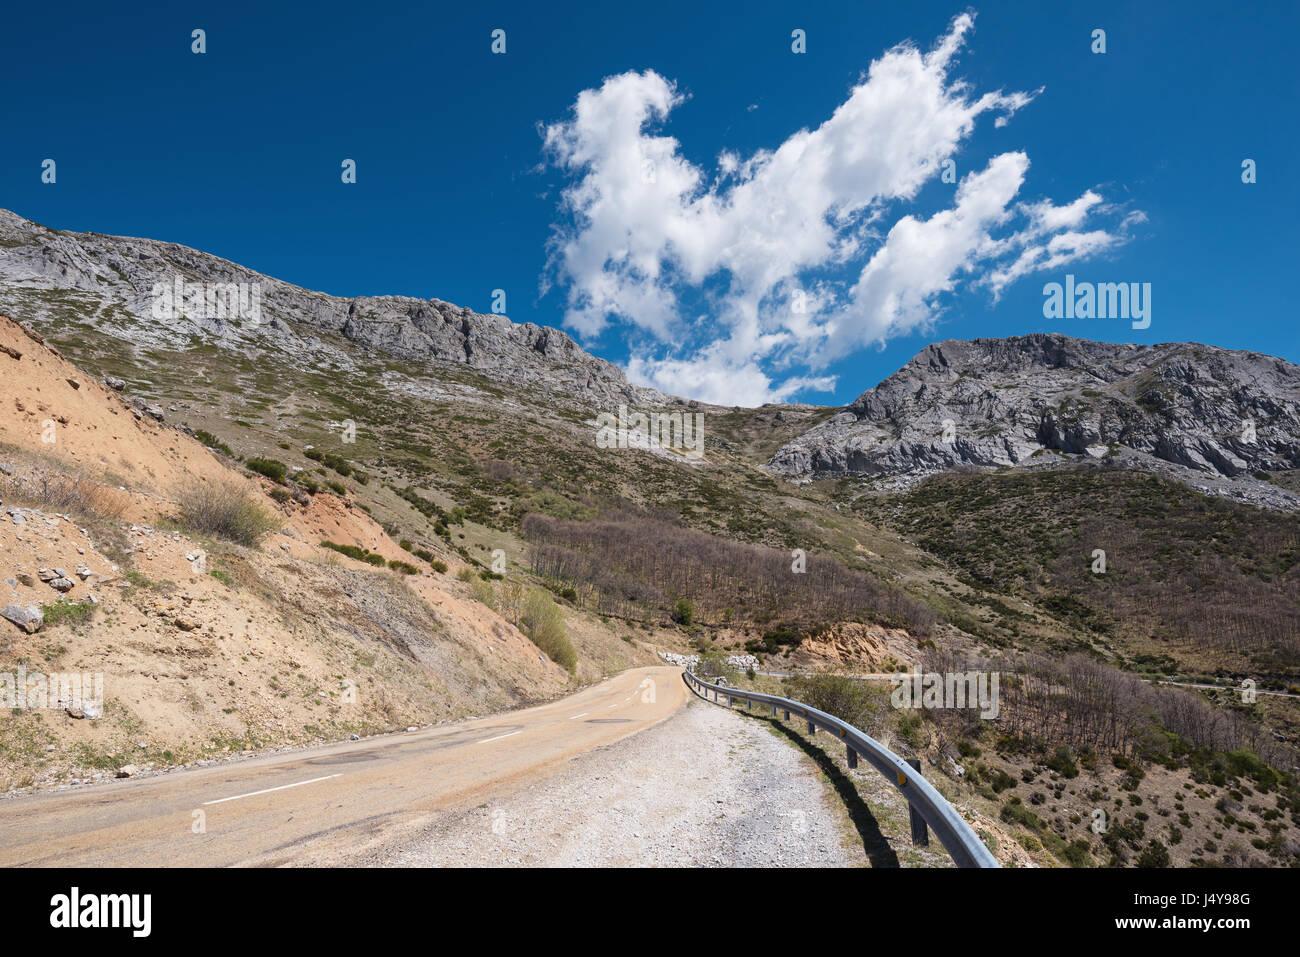 Mountain road in Palencia province, castilla y Leon, Spain. - Stock Image